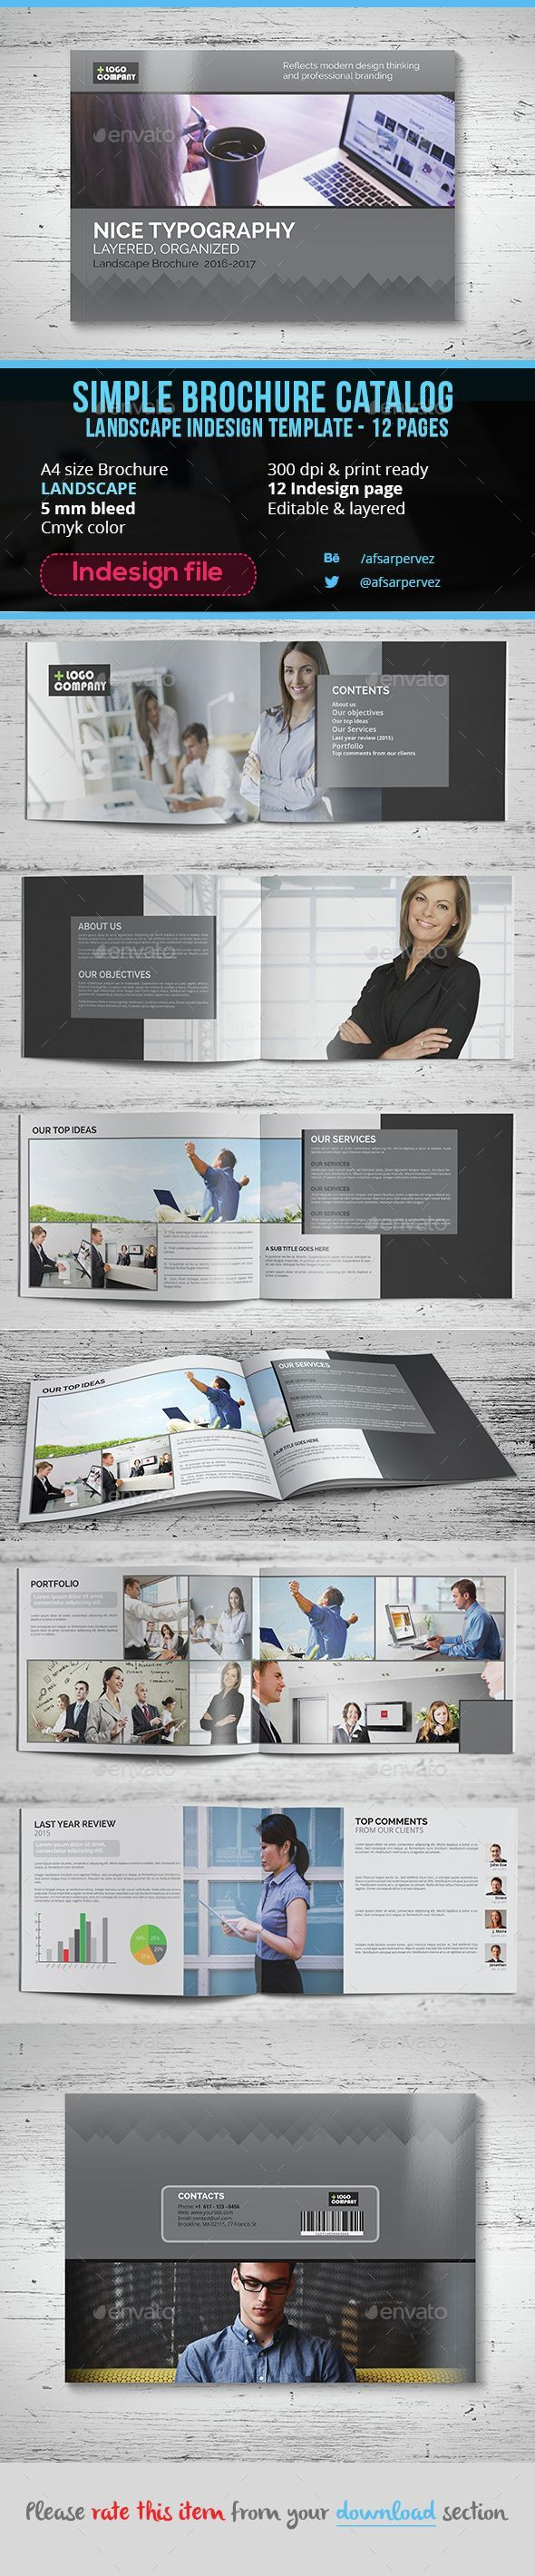 Simple landscape brochure indesign template 12 page brochures simple landscape brochure indesign template 12 page brochures print templates maxwellsz